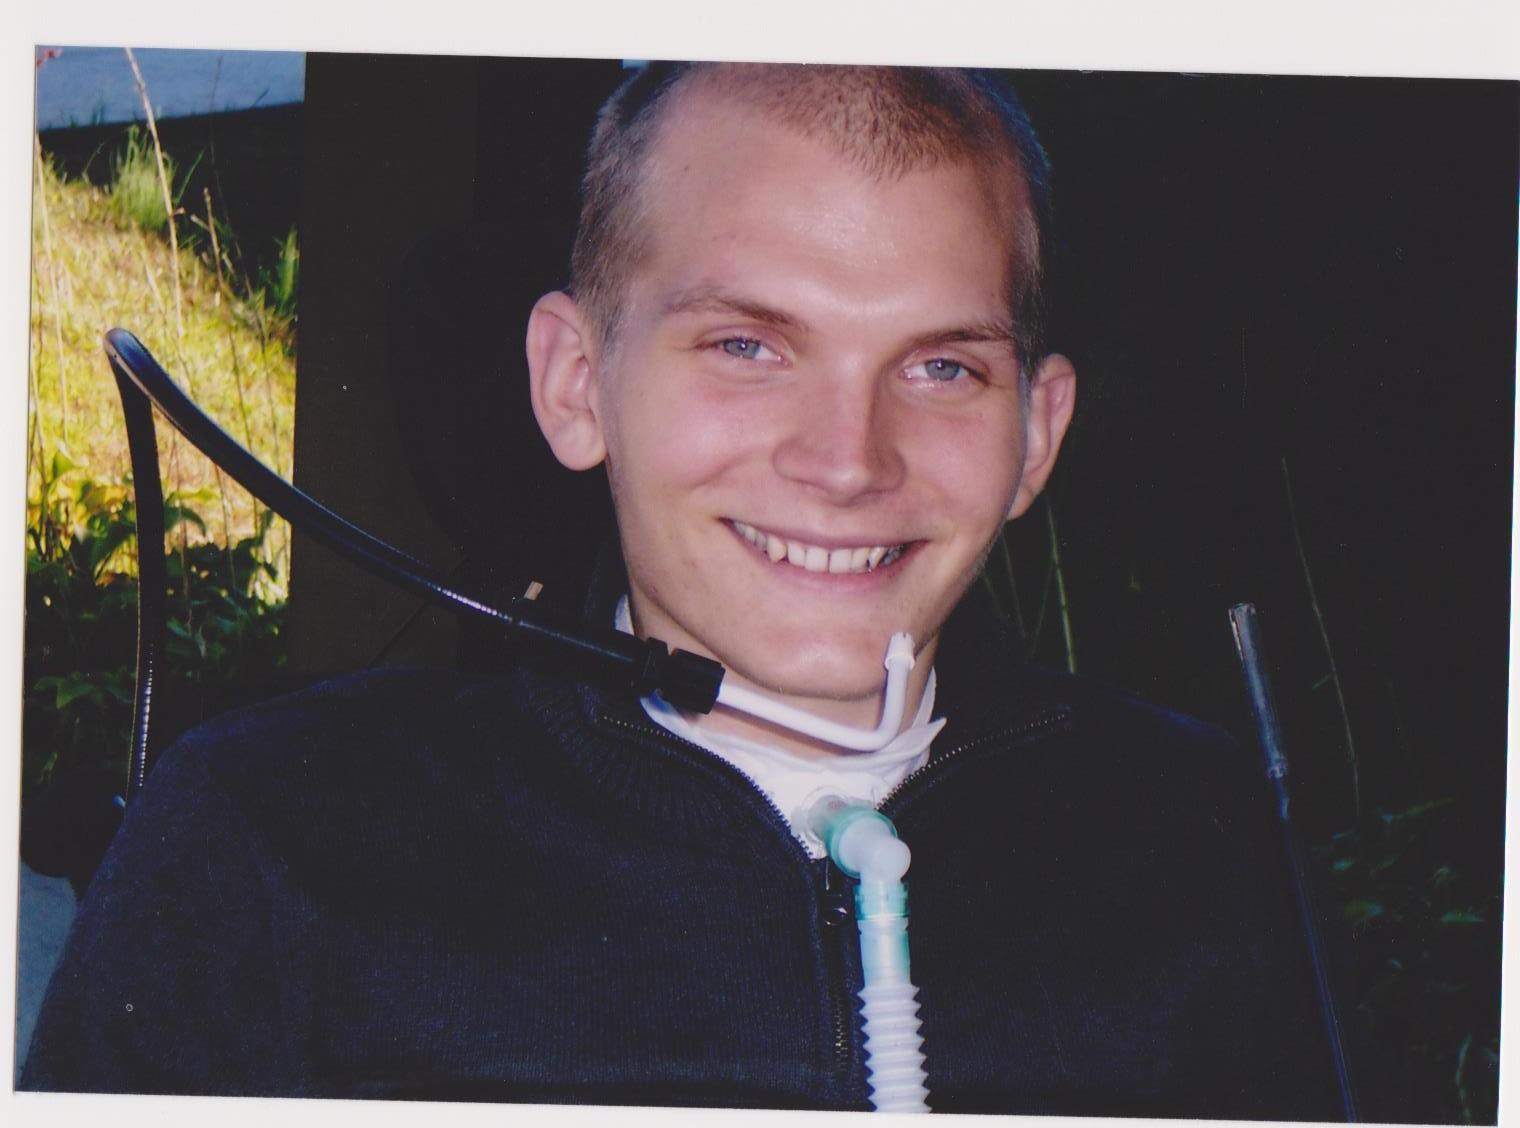 Justin Cochran Memorial Fund